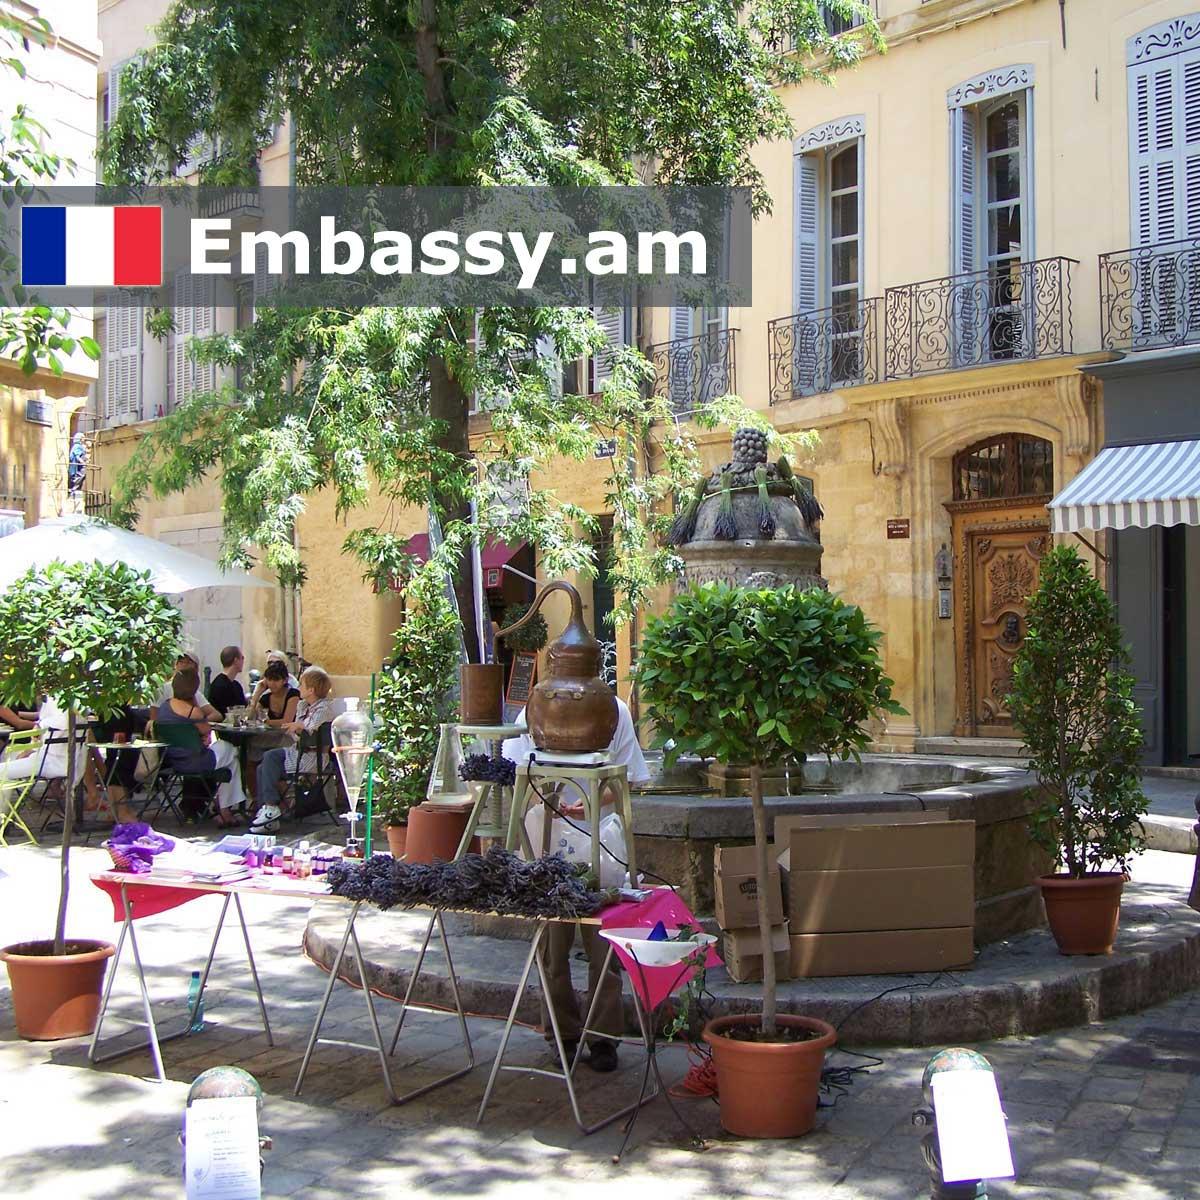 Экс-ан-Прованс - Отели во Франции - Embassy.am